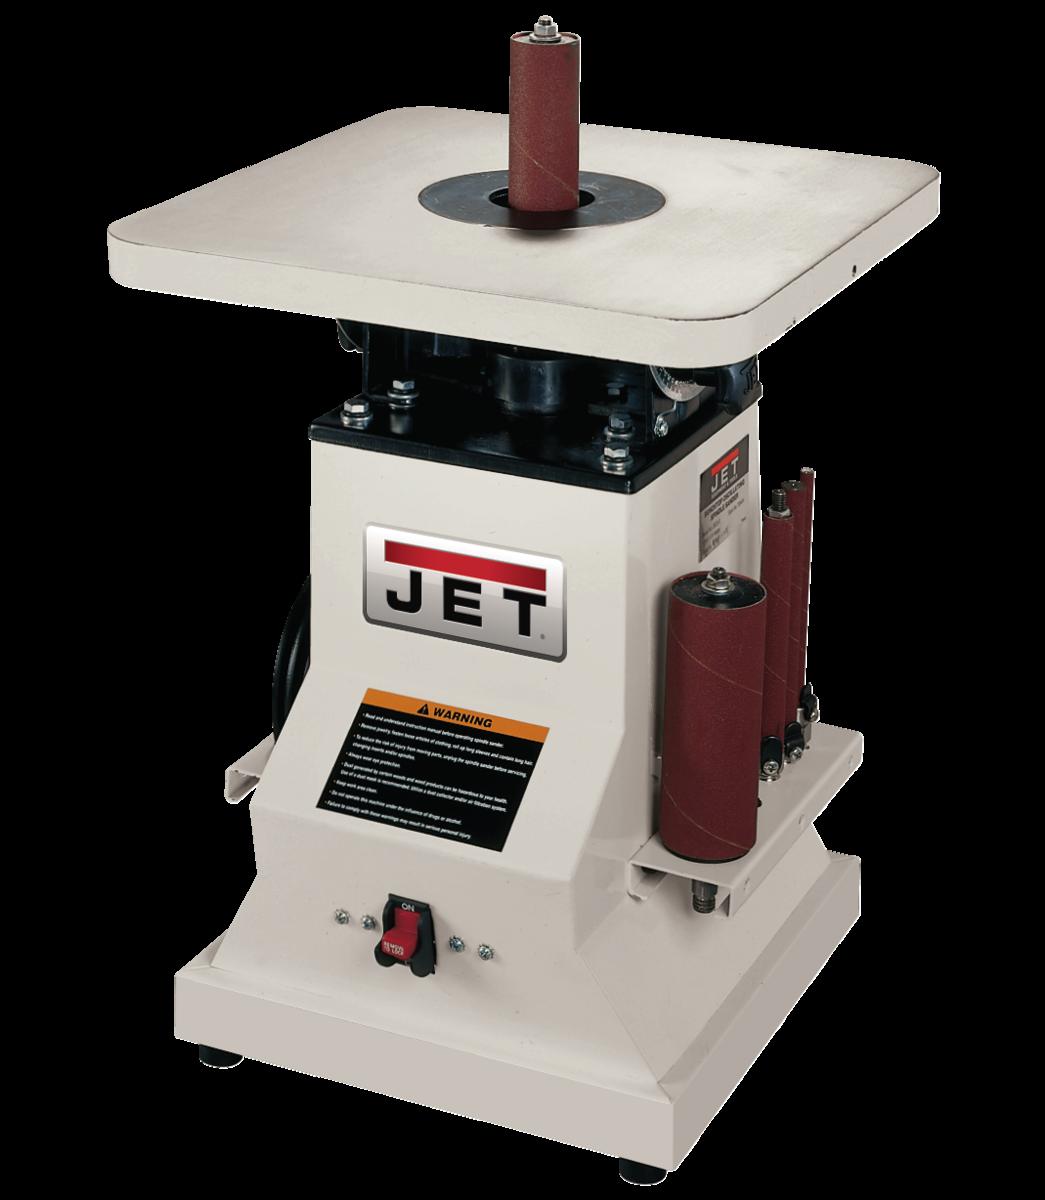 JBOS-5, Benchtop Oscillating Spindle Sander, 1/2HP, 1Ph 115V